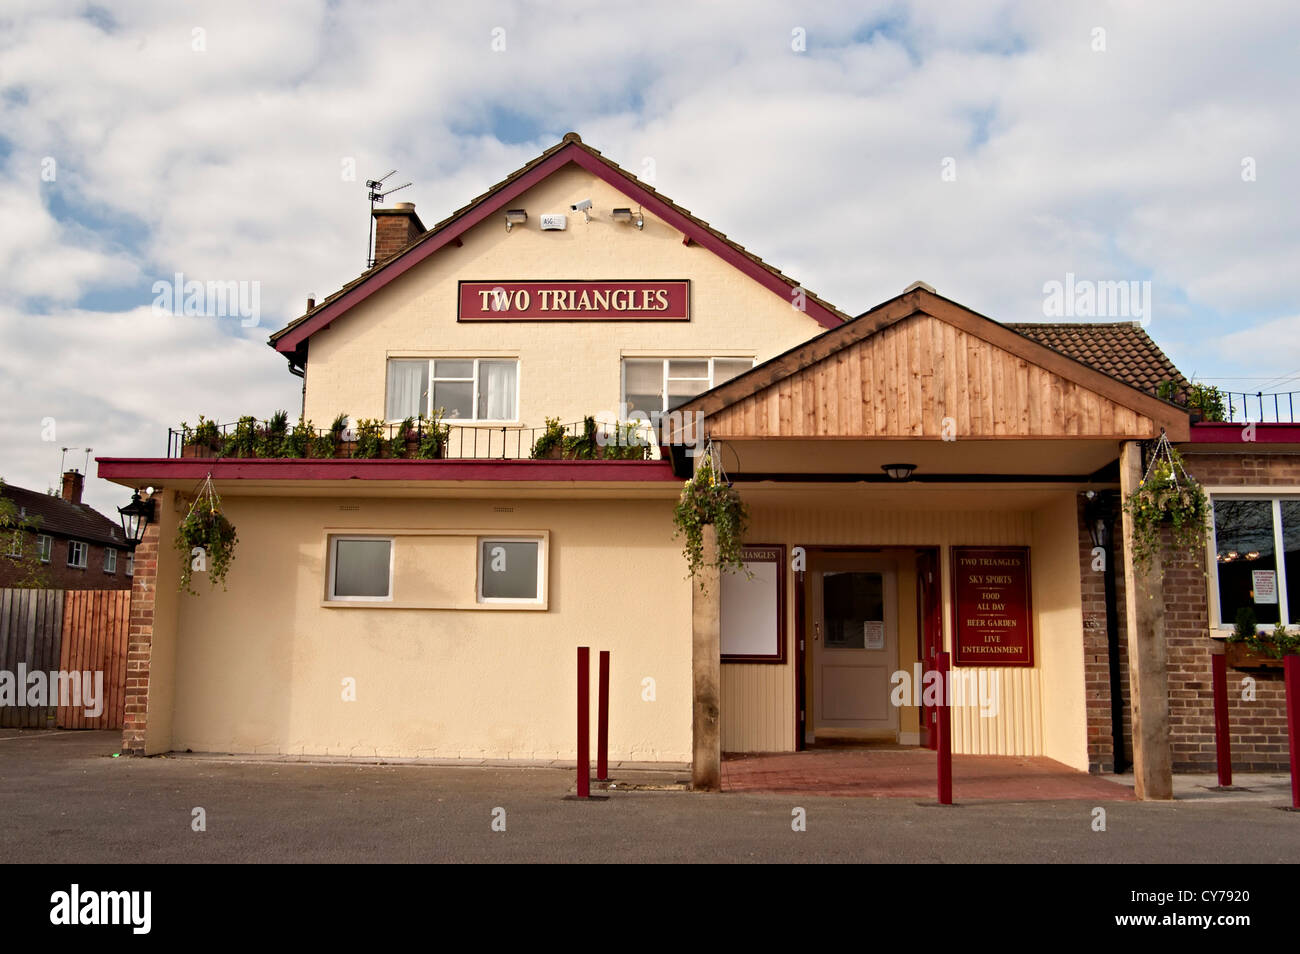 the two triangles tavern pub bar inn bar - Stock Image